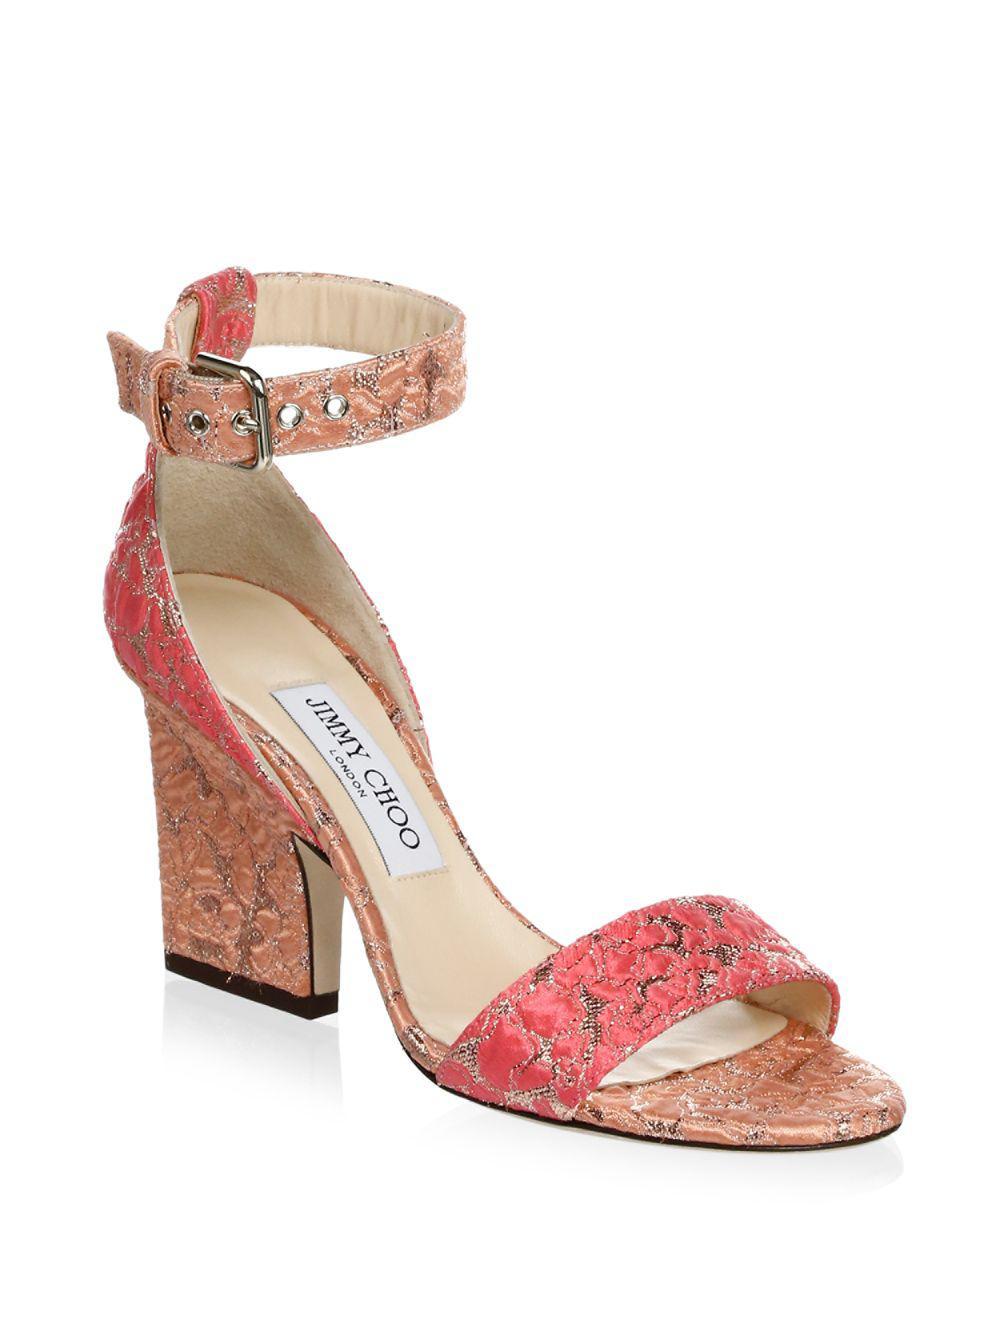 9a9aad6c817 Jimmy Choo - Pink Block Heel Sandals - Lyst. View fullscreen